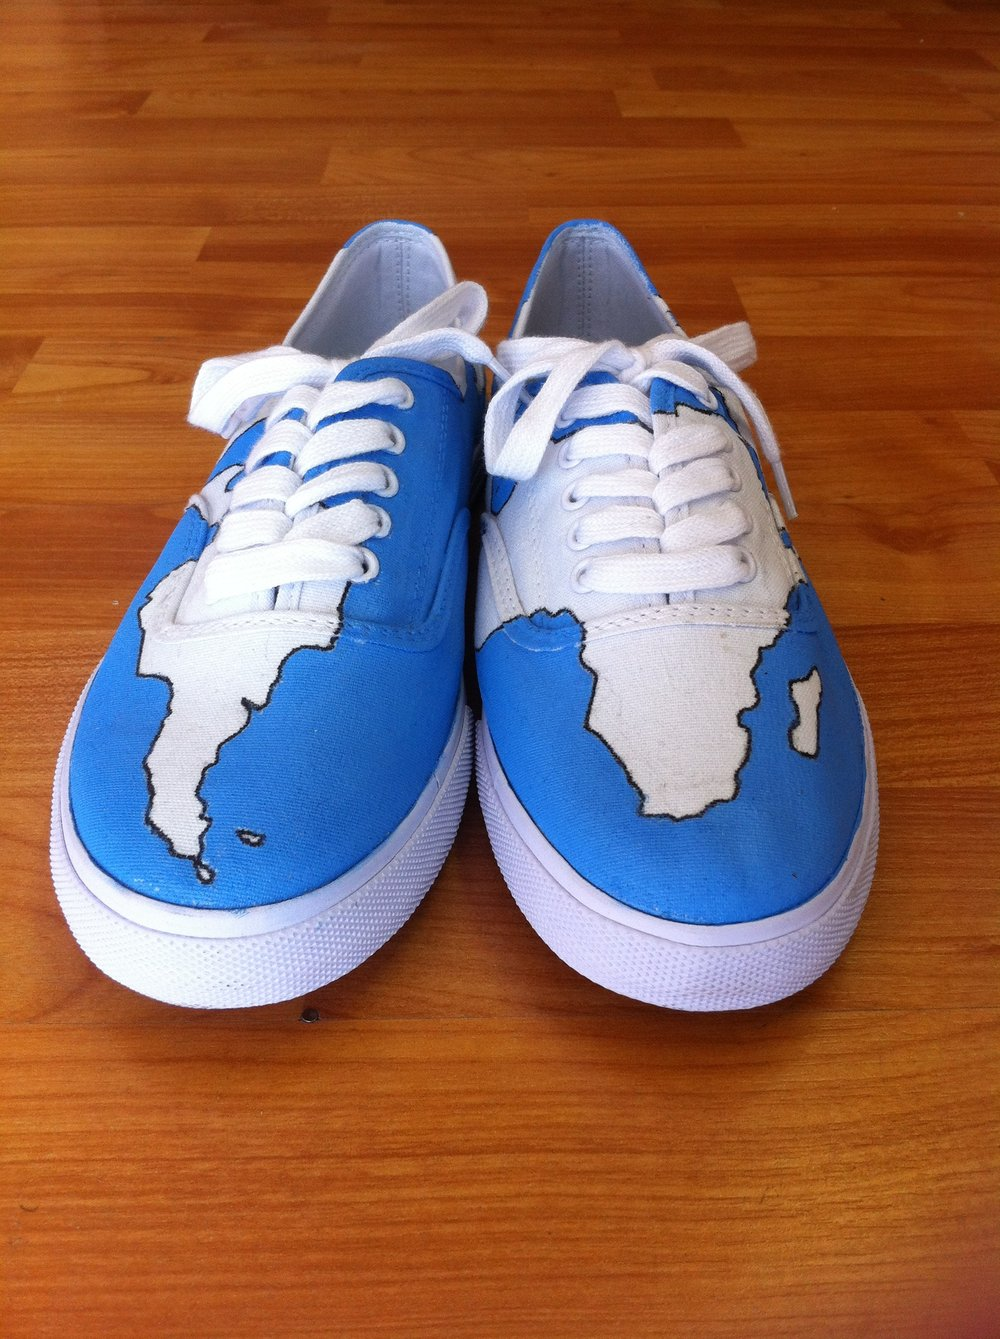 shoes-e1321132307252.jpg